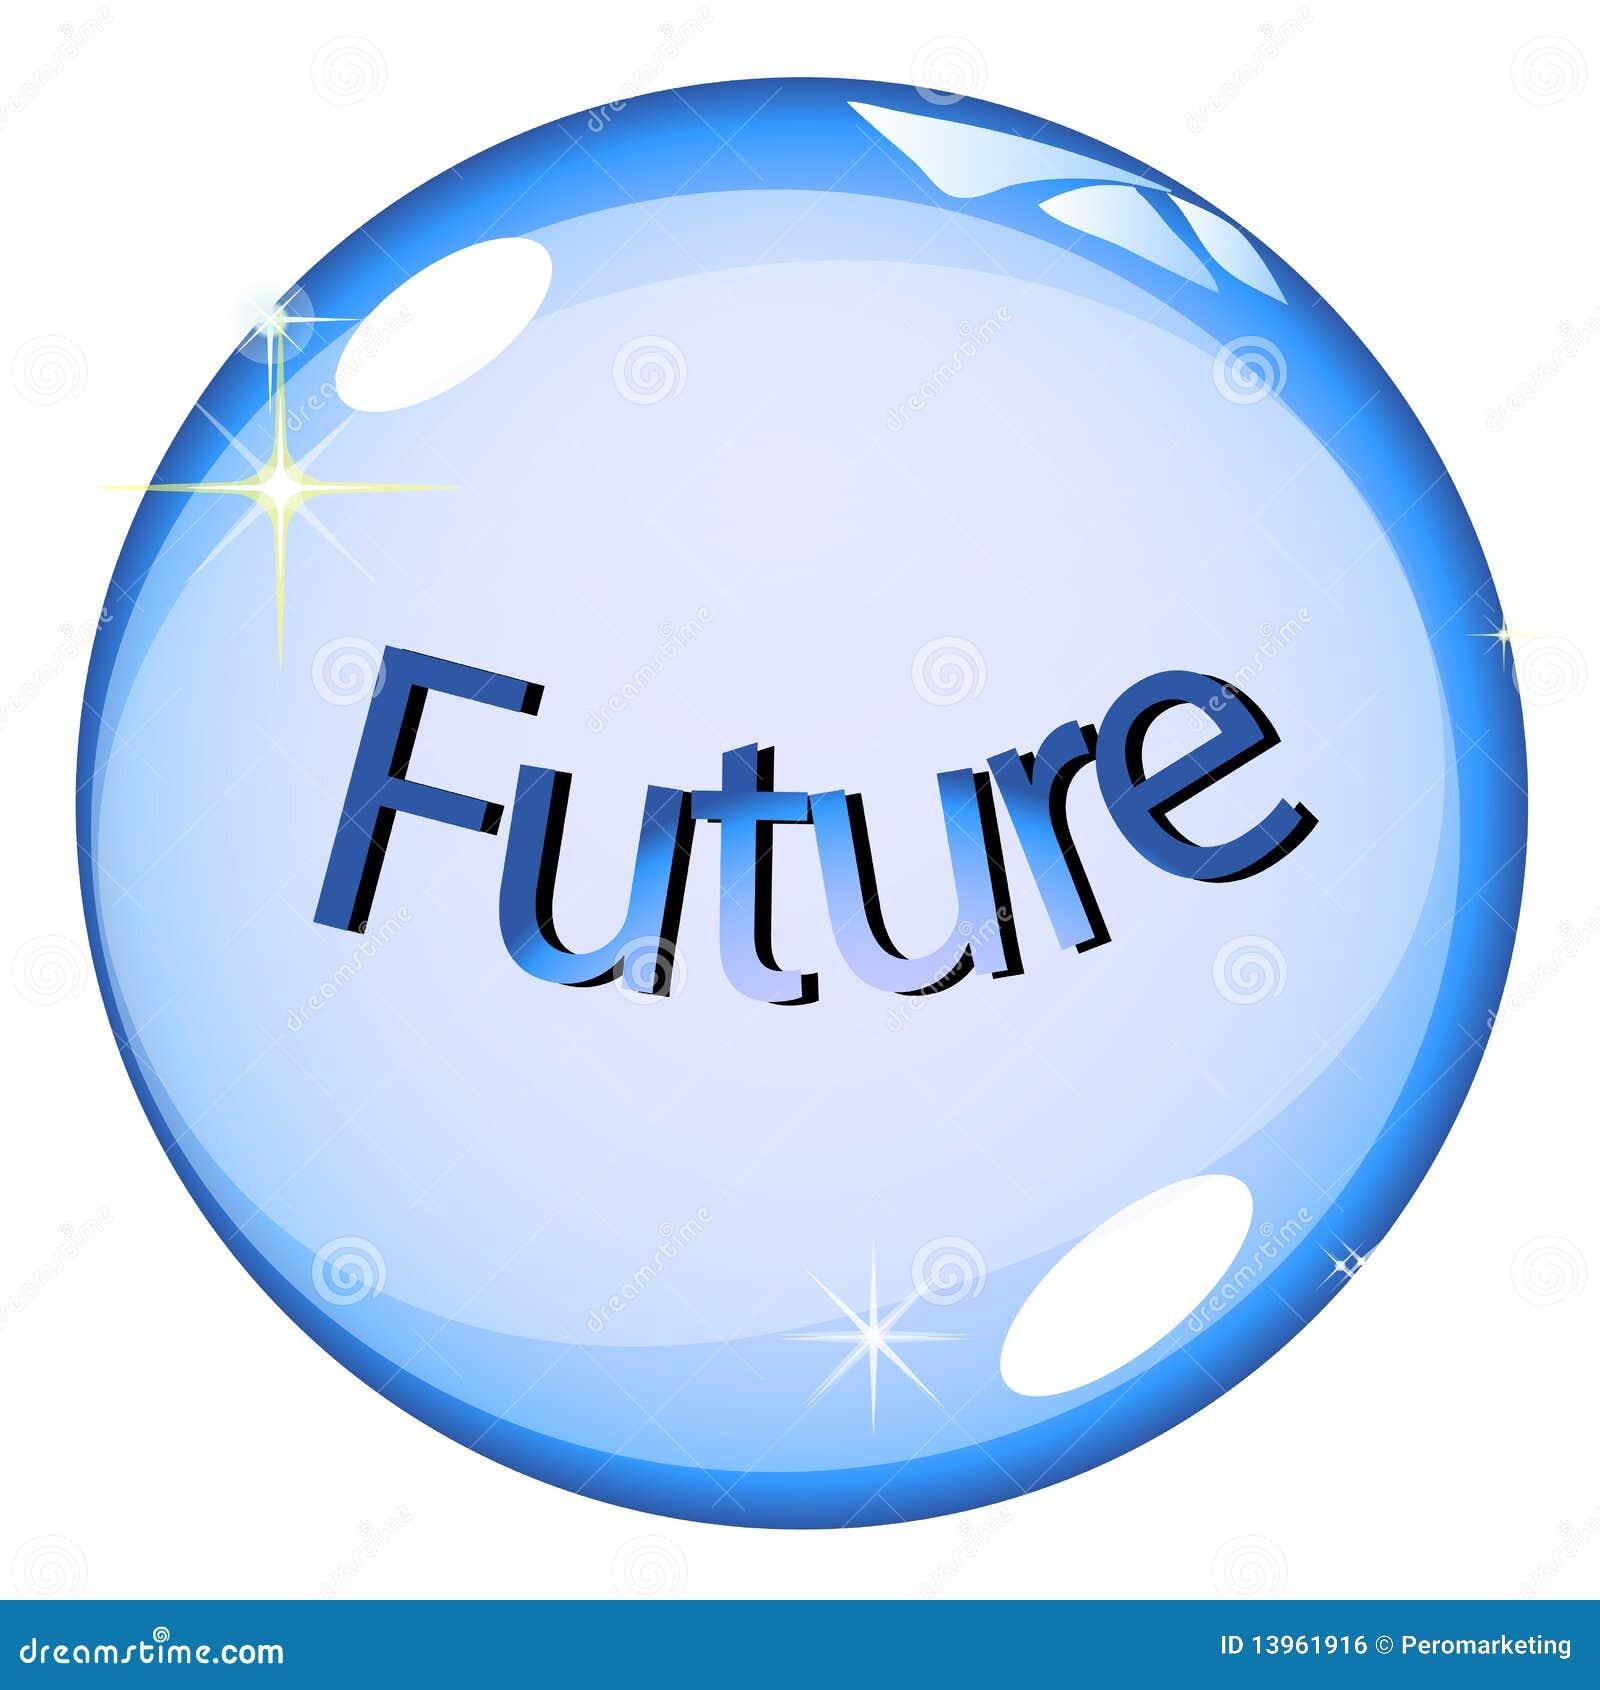 Kristallkugel Zukunft